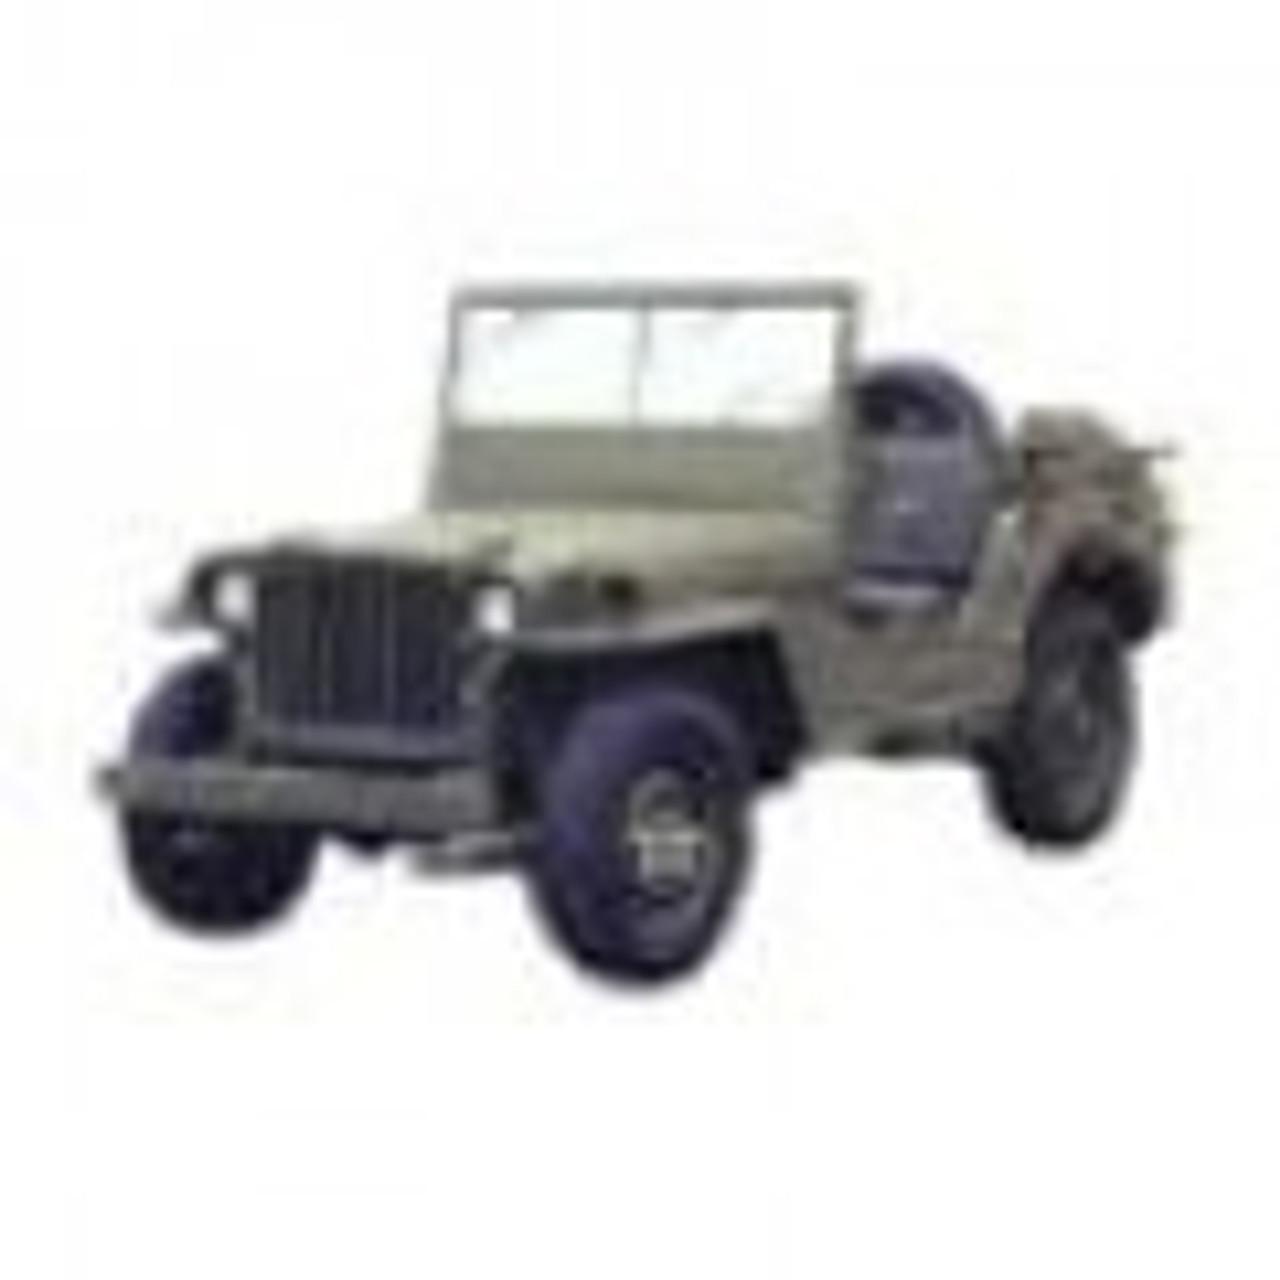 1941-45 MB & GPW Body Parts